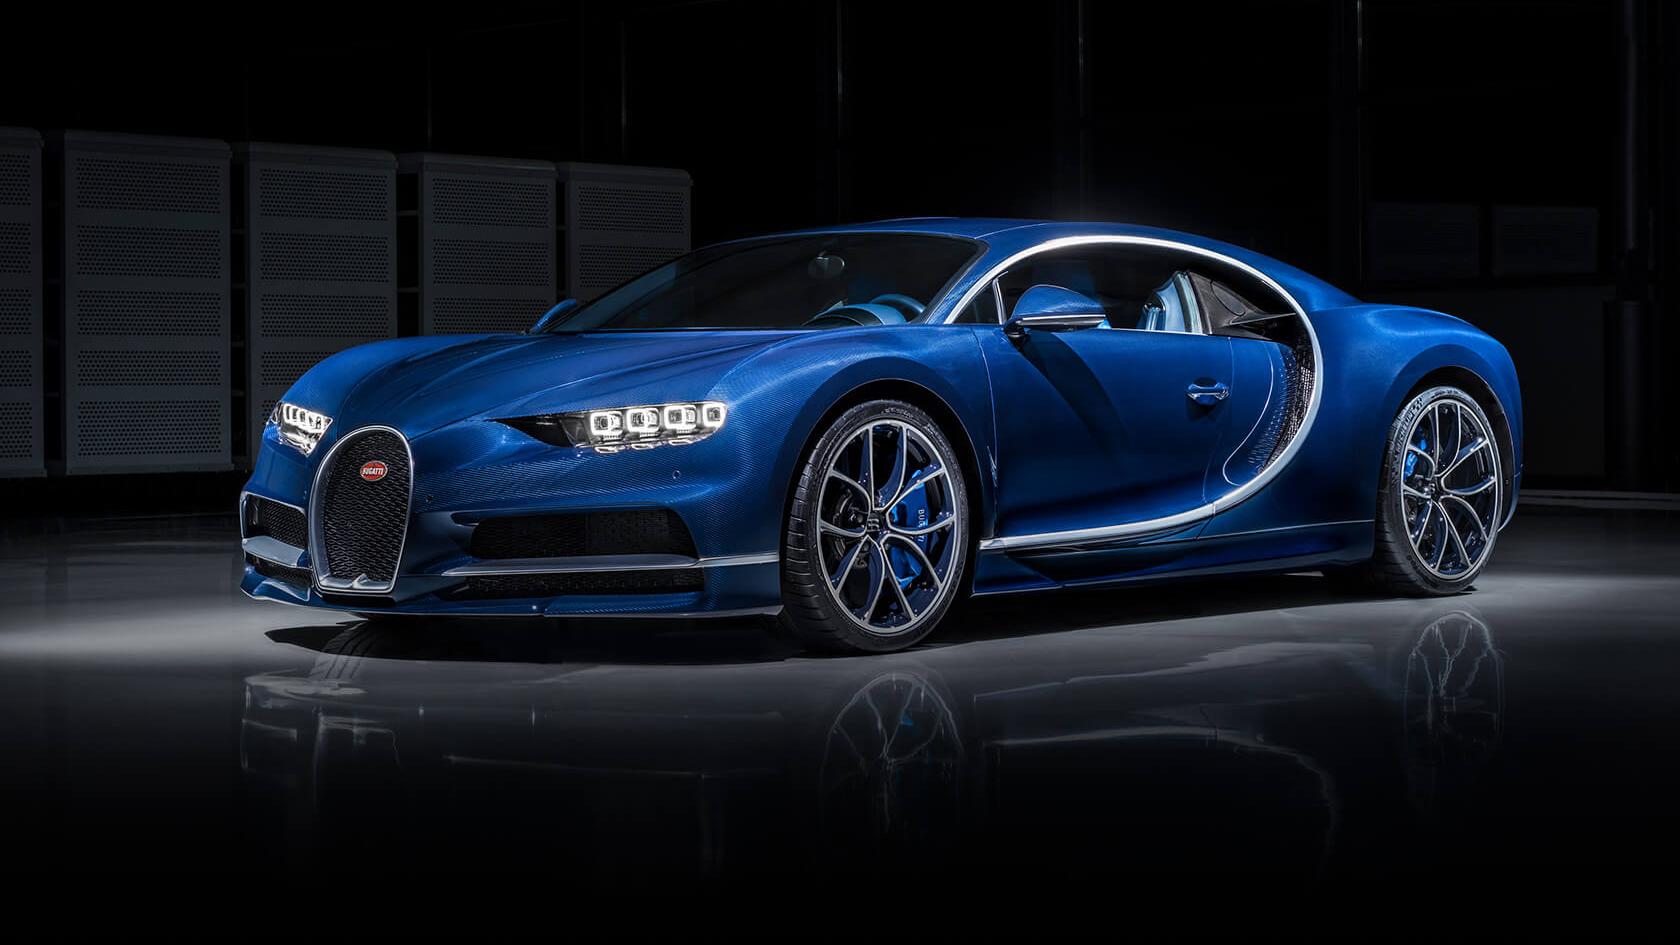 Bugatti Chiron Testing a 3D Printed Titanium Brake Caliper | All3DP